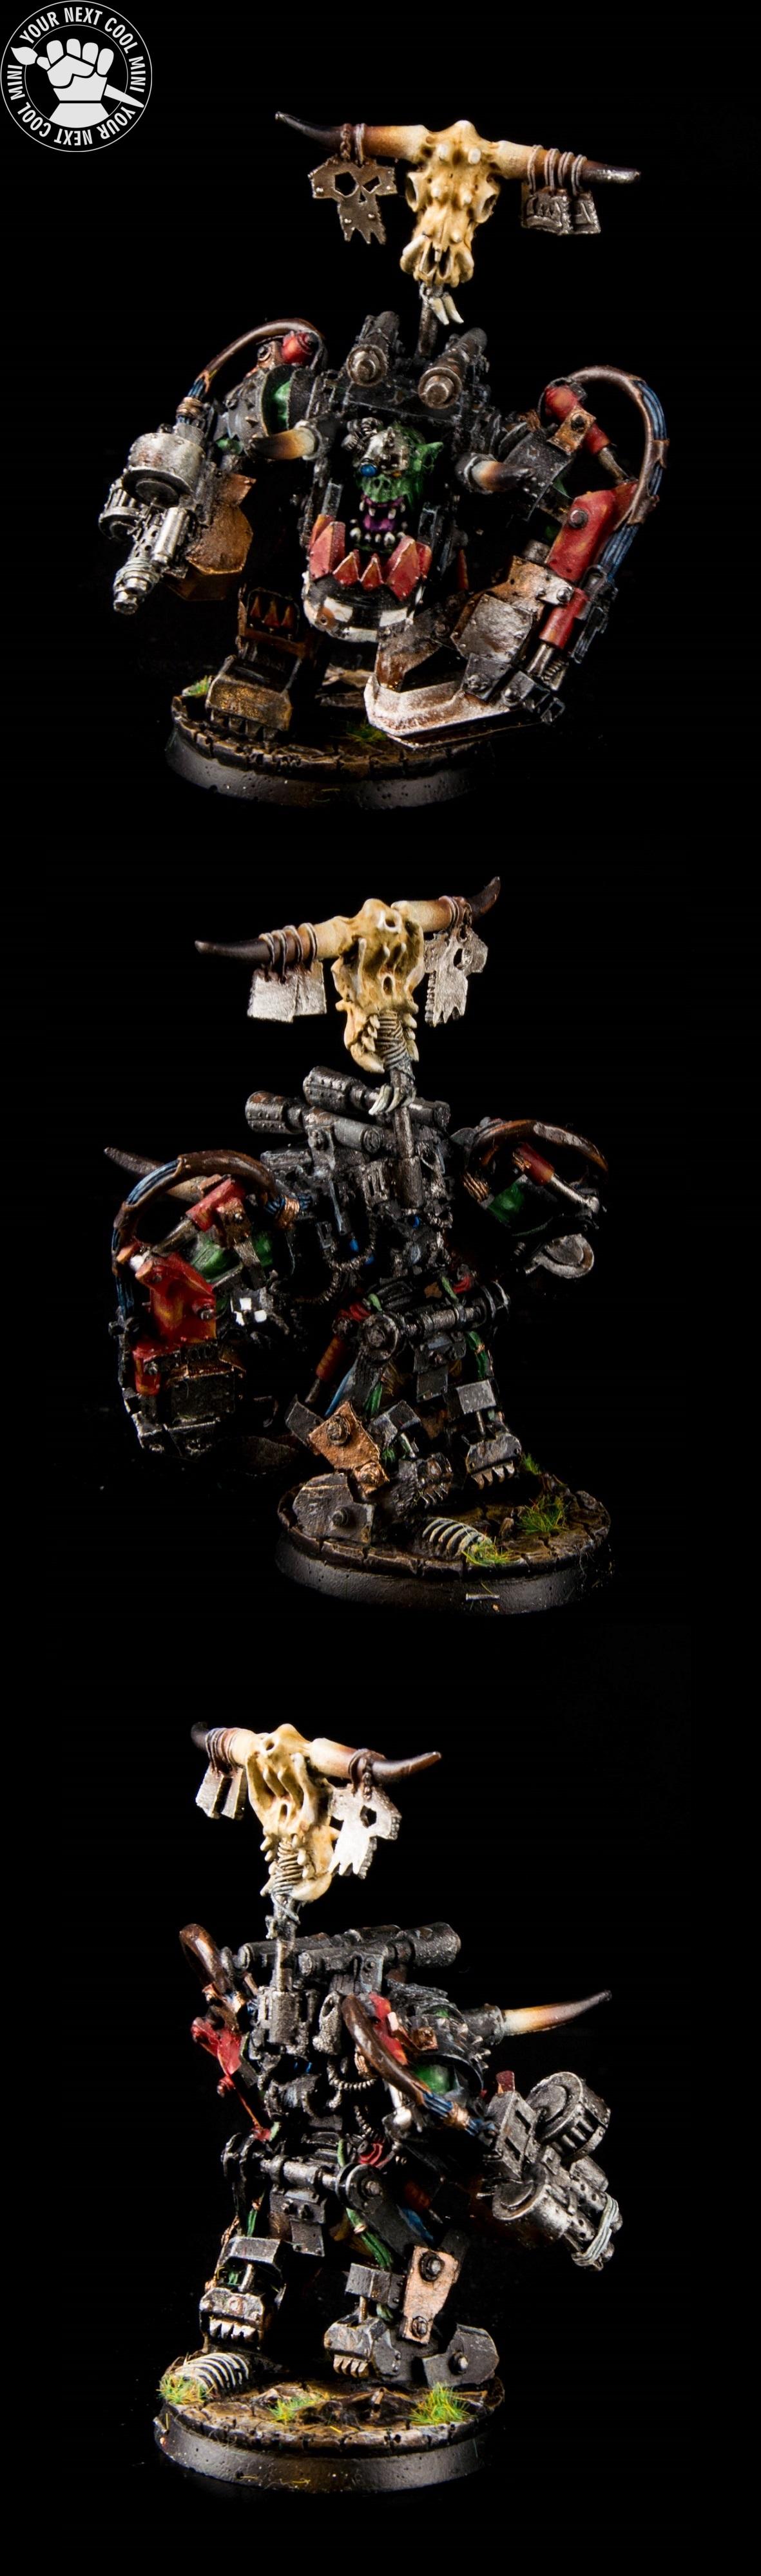 Warhammer 40K Space Orks, Ghazghkull Thraka, Black